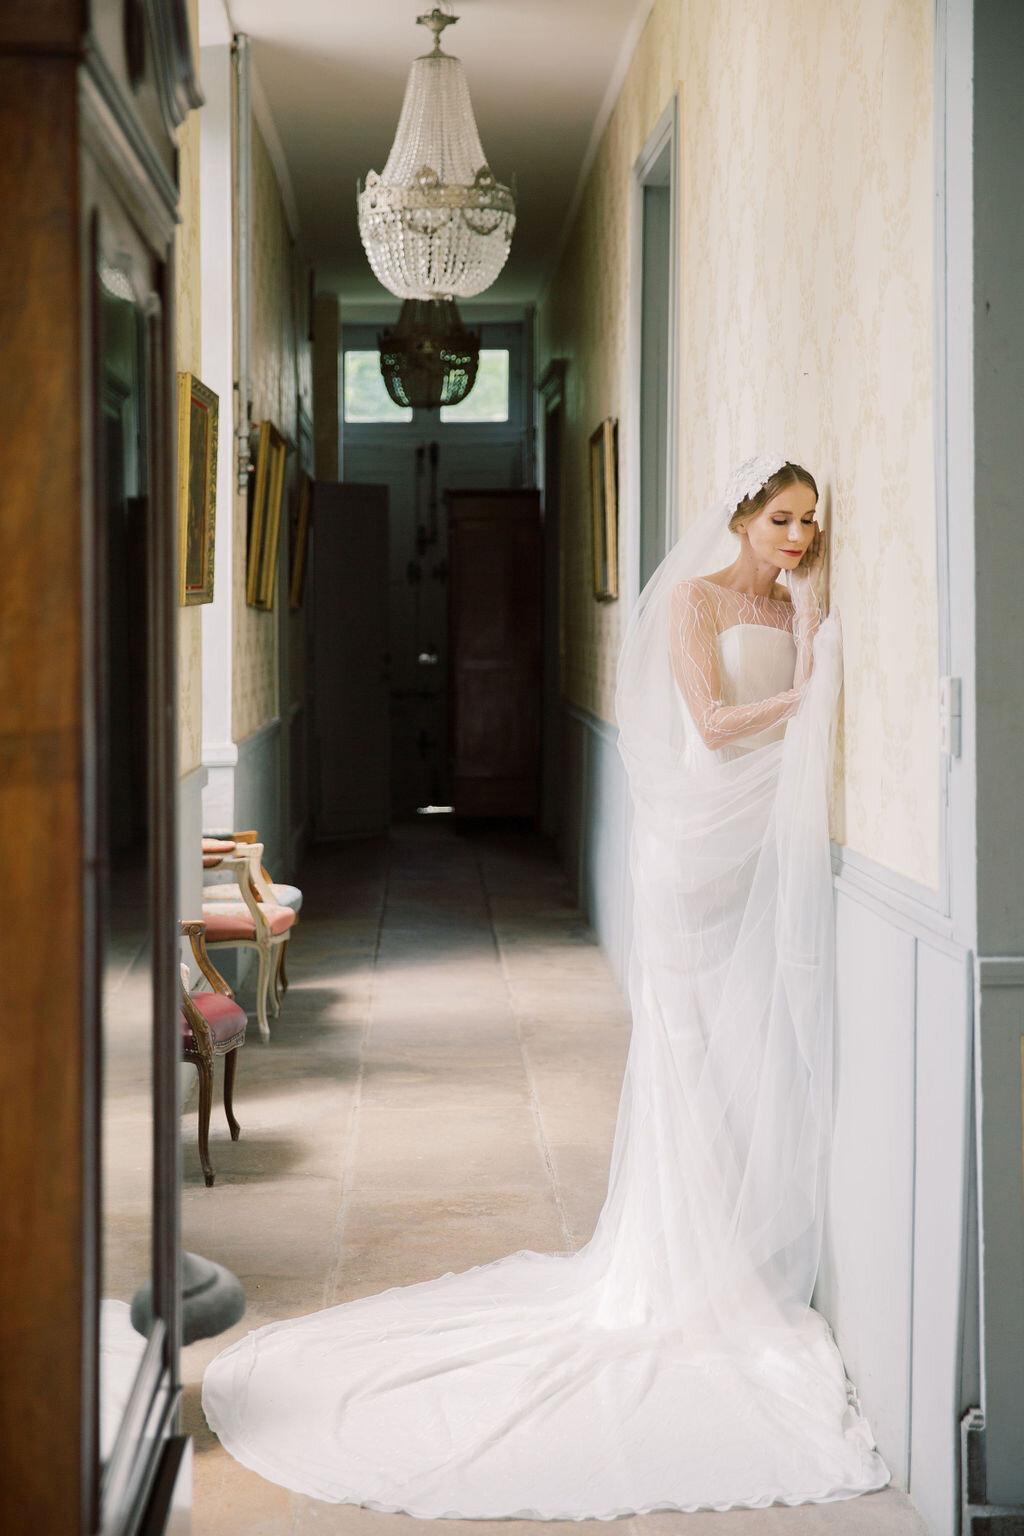 Wedding_Veil_Madame_Tulle_Amelia_Soegijono0116.JPG